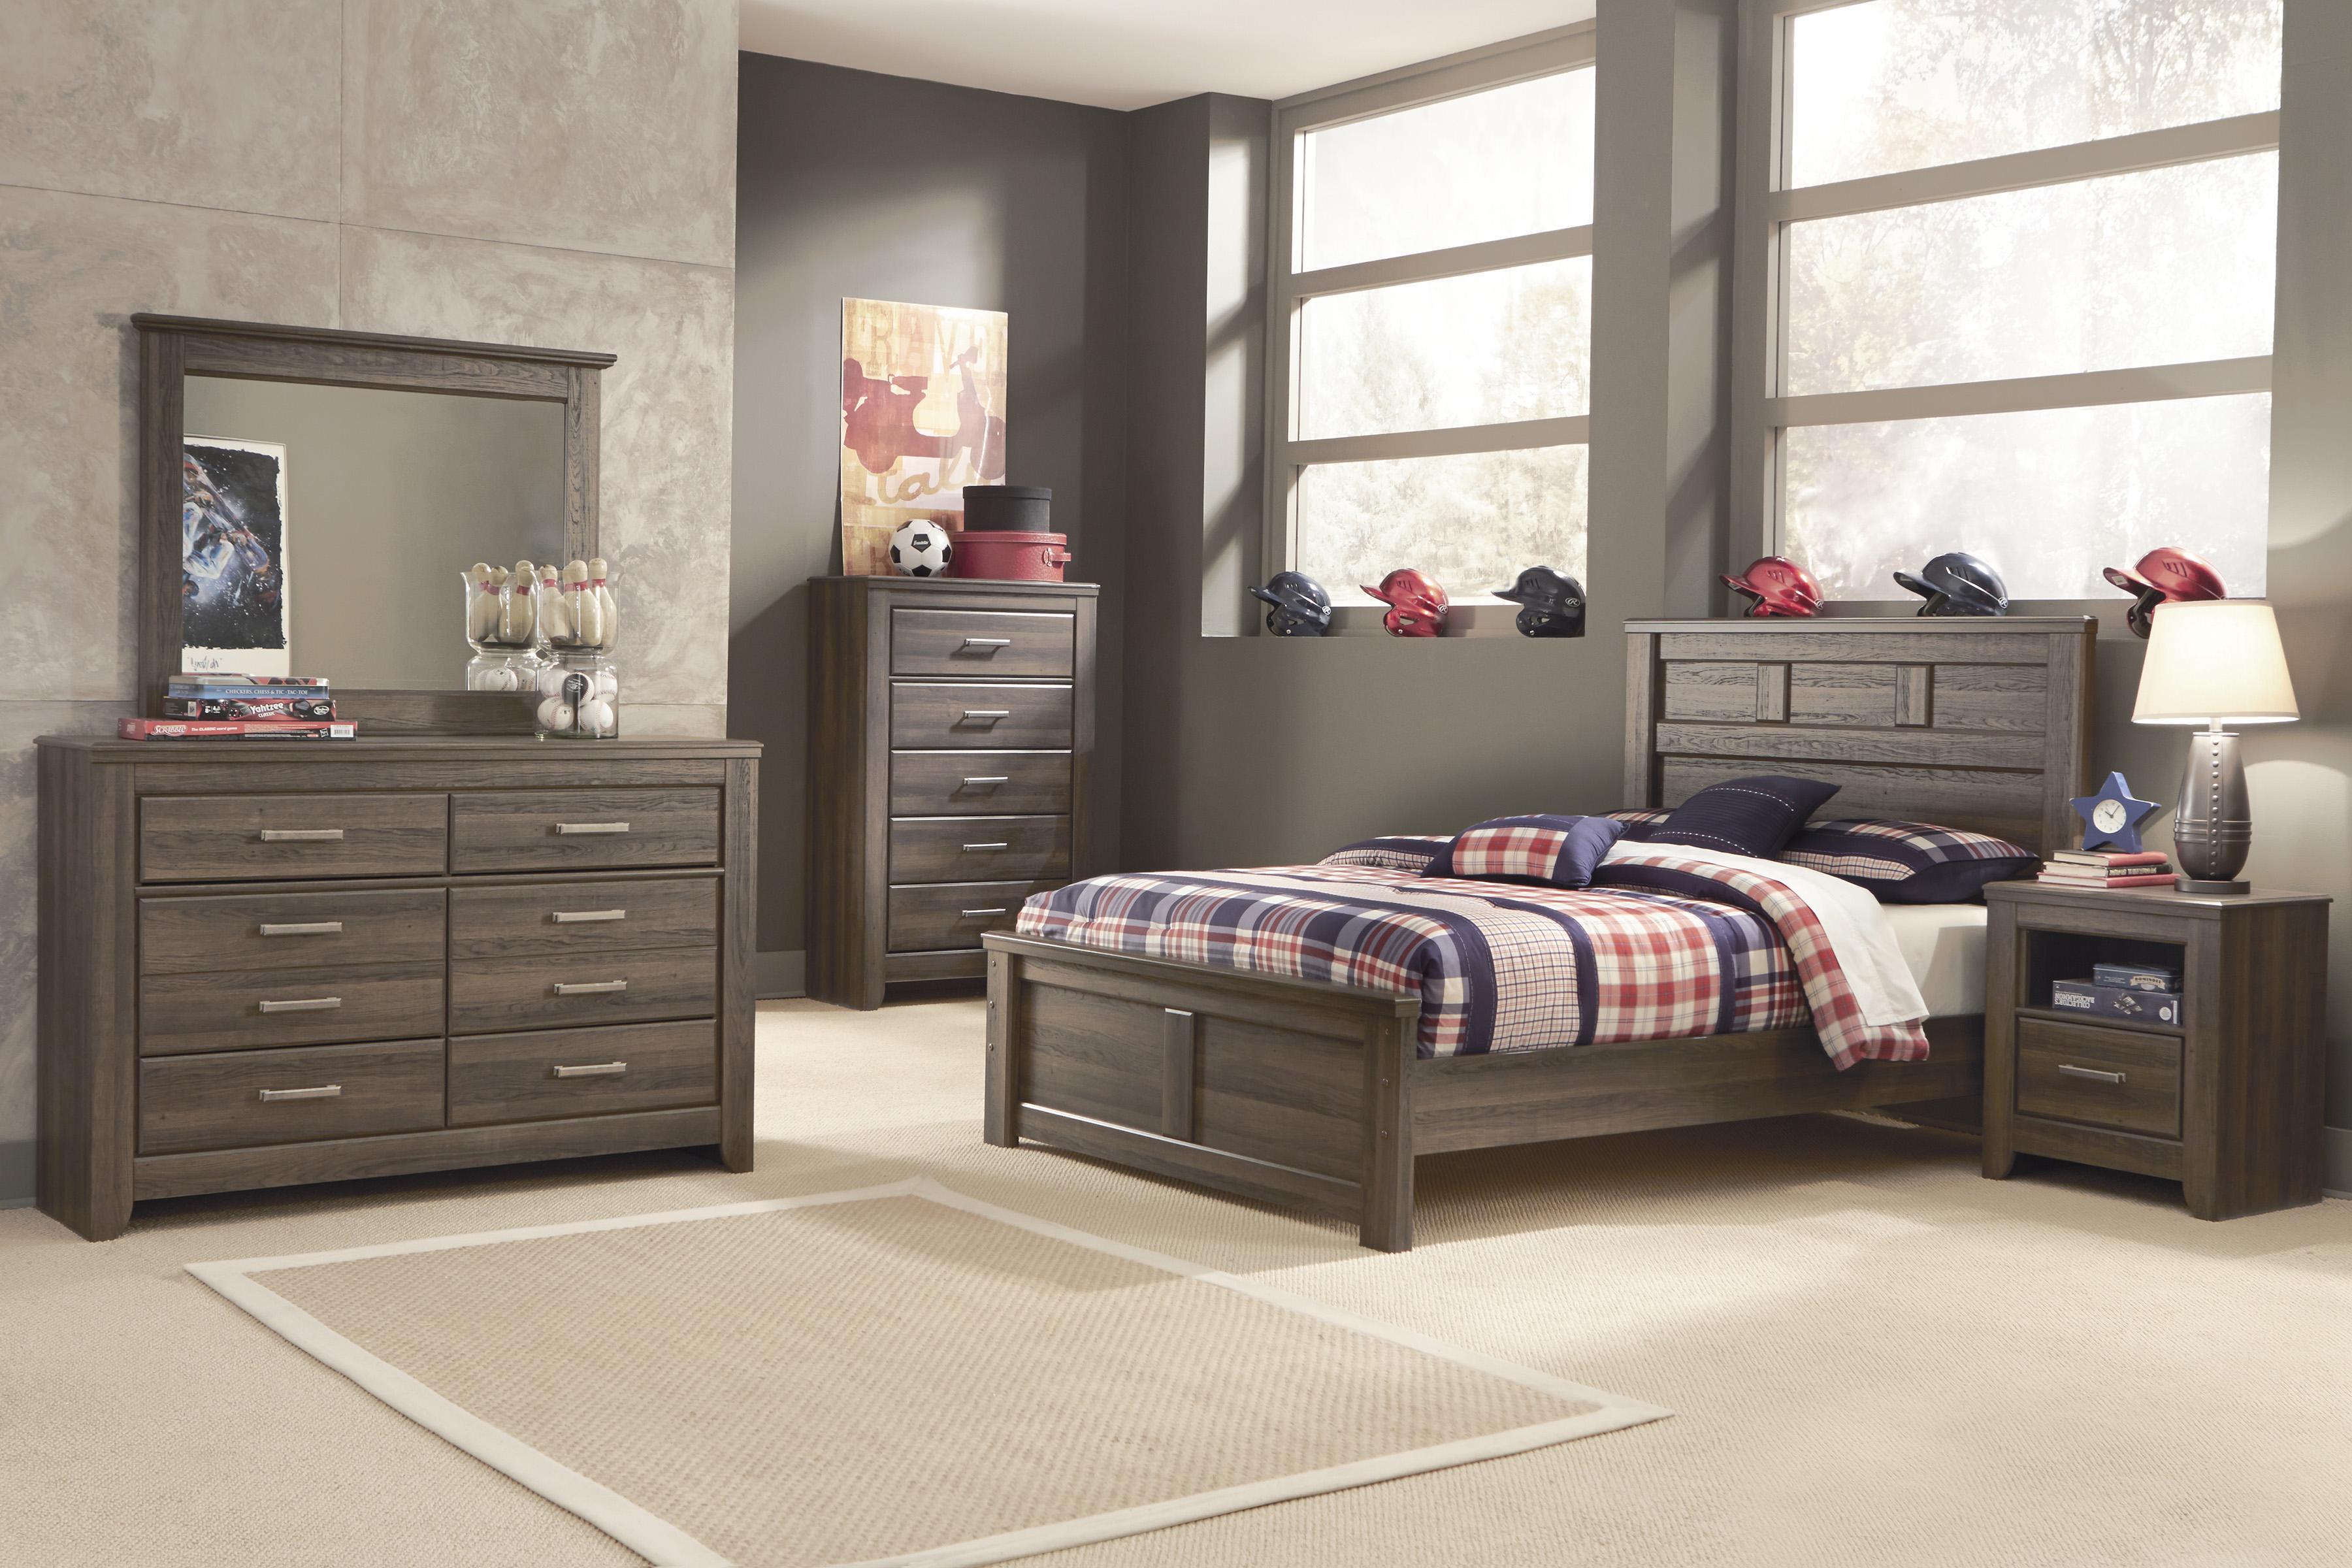 Signature Design By Ashley Juararo Full Bedroom Group